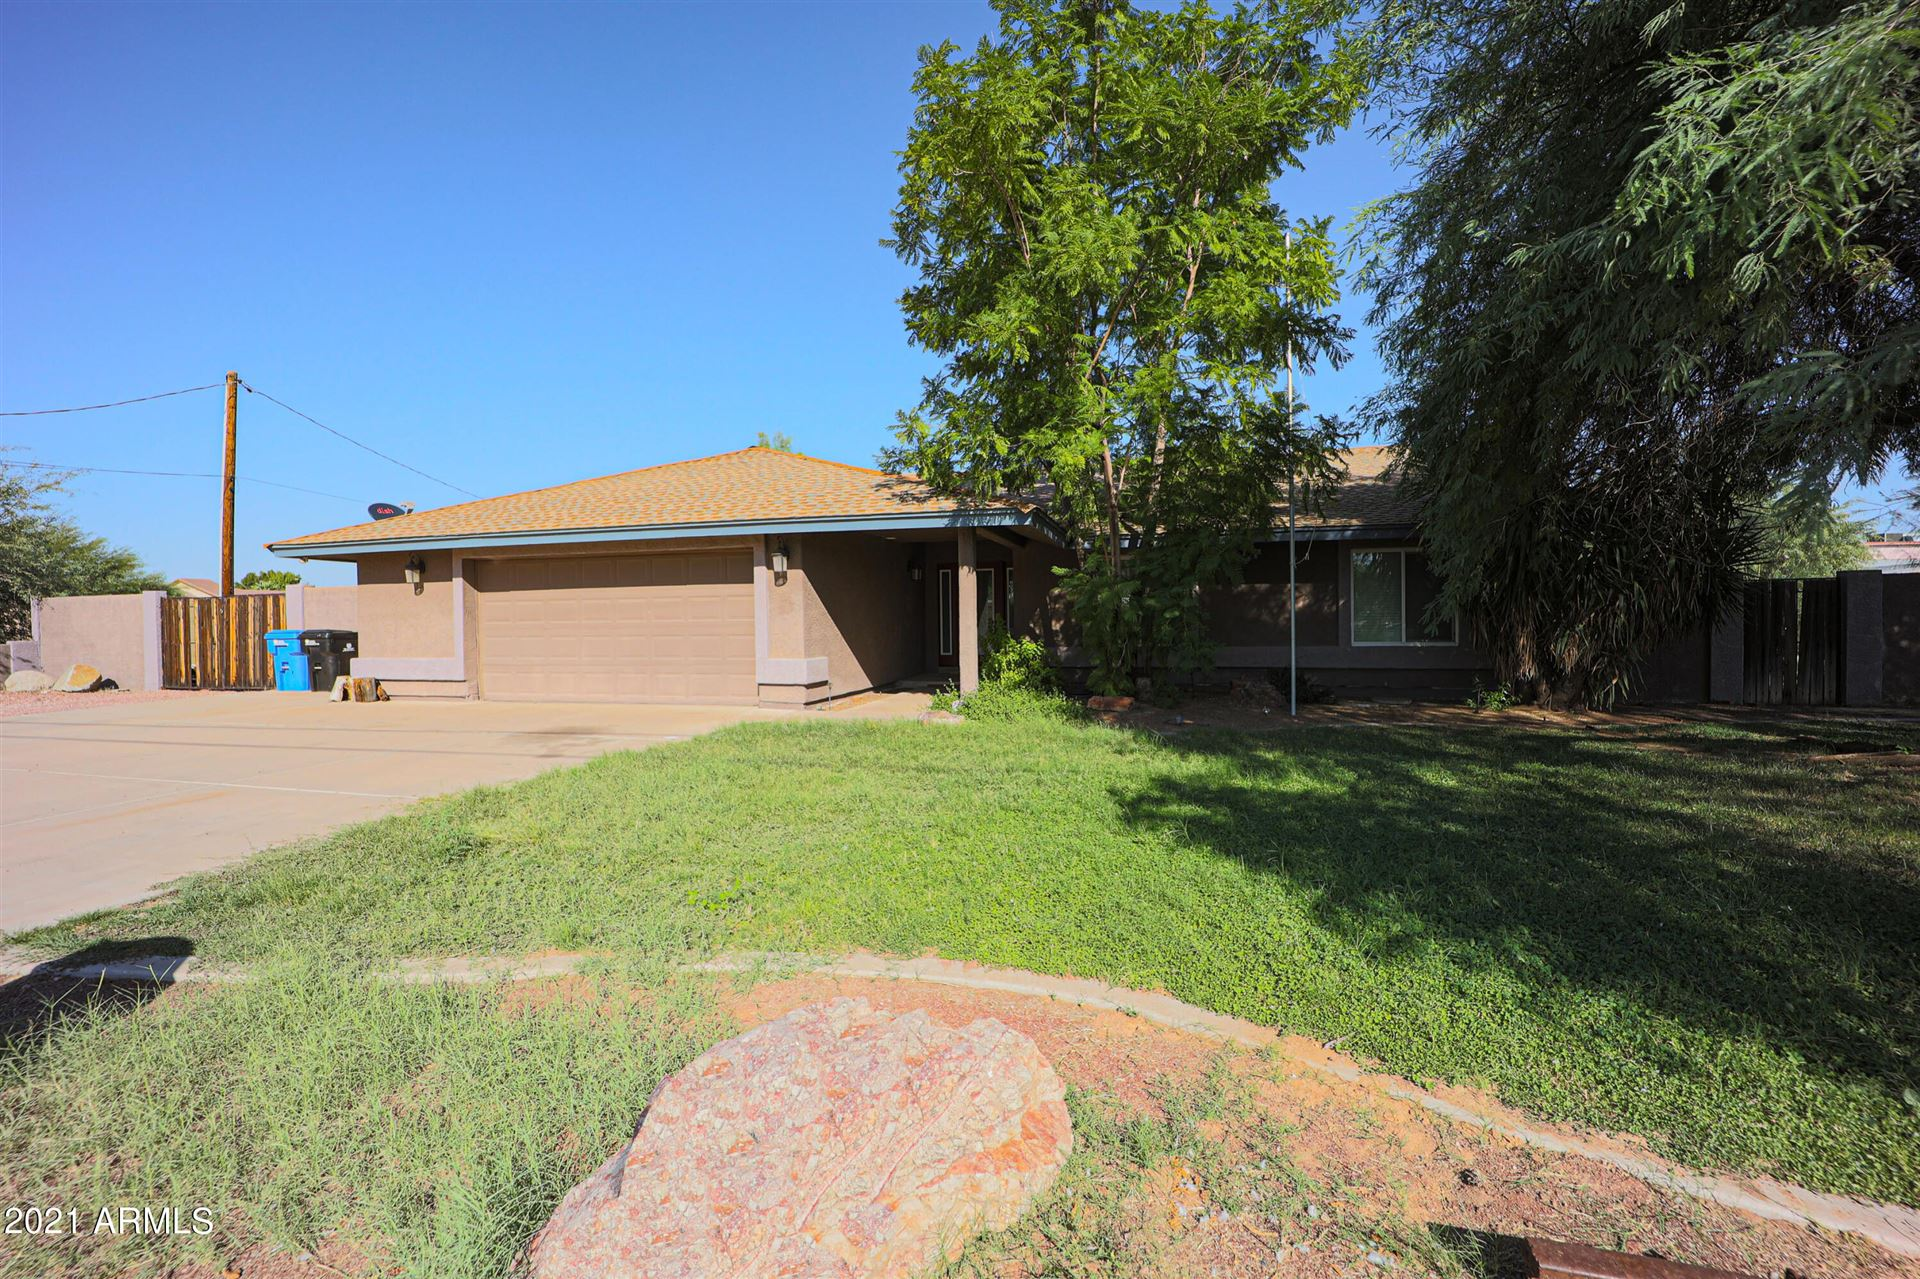 19025 N 29TH Place, Phoenix, AZ 85050 - MLS#: 6297754